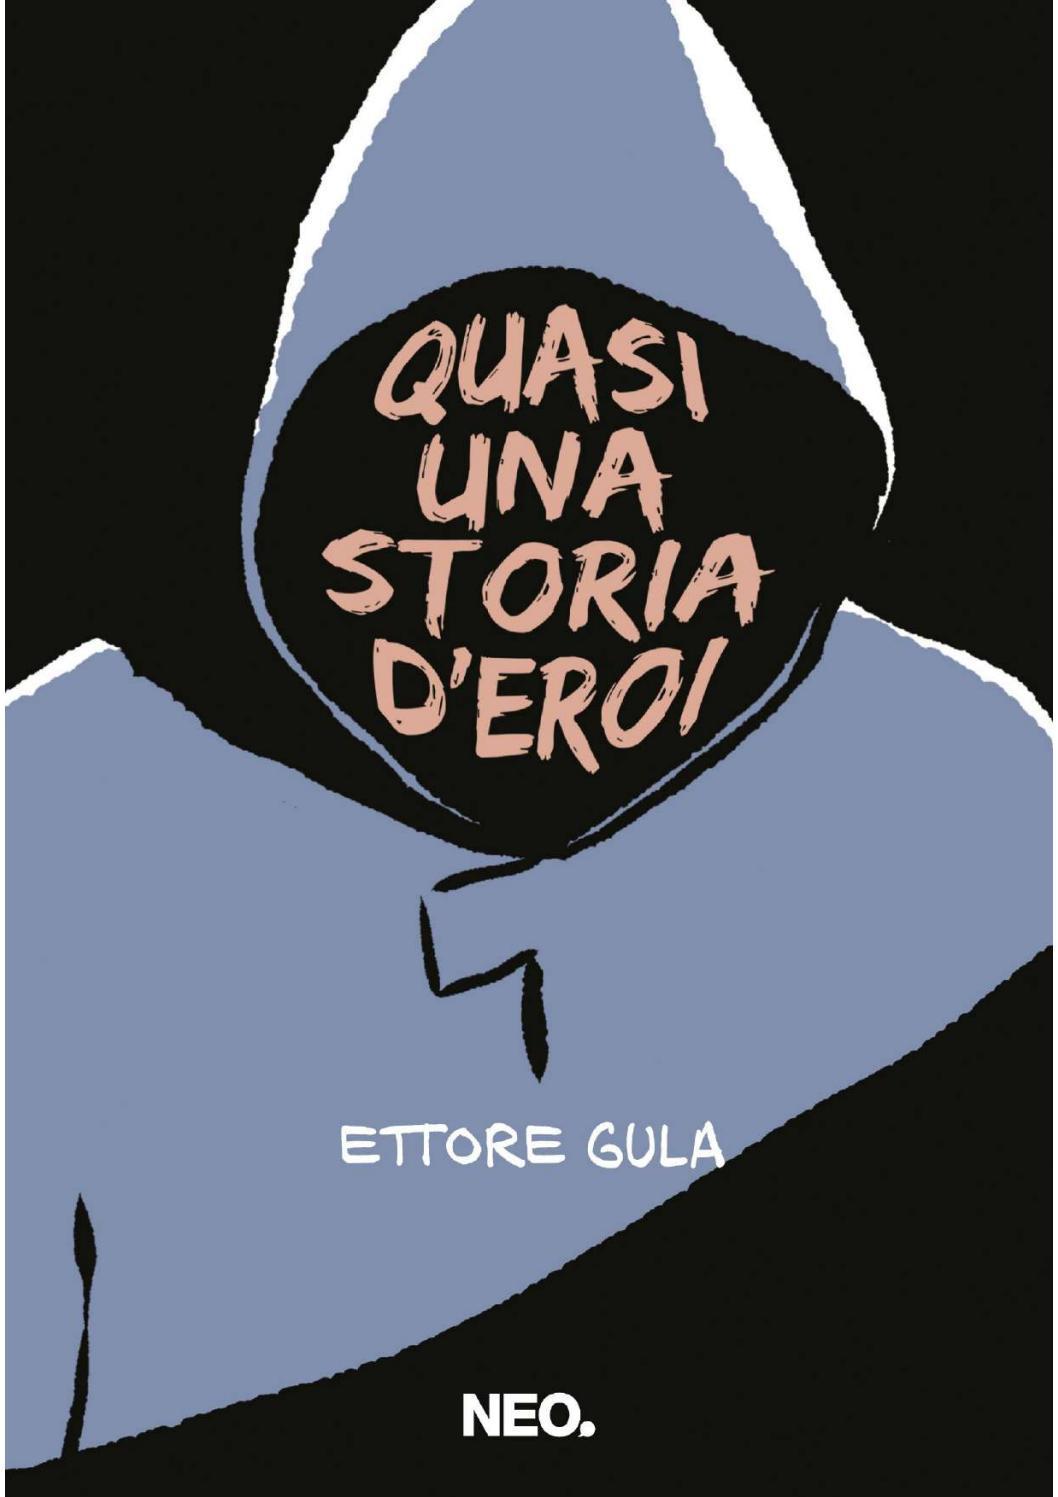 Recensione di Quasi Una Storia D'Eroi – Ettore Gula